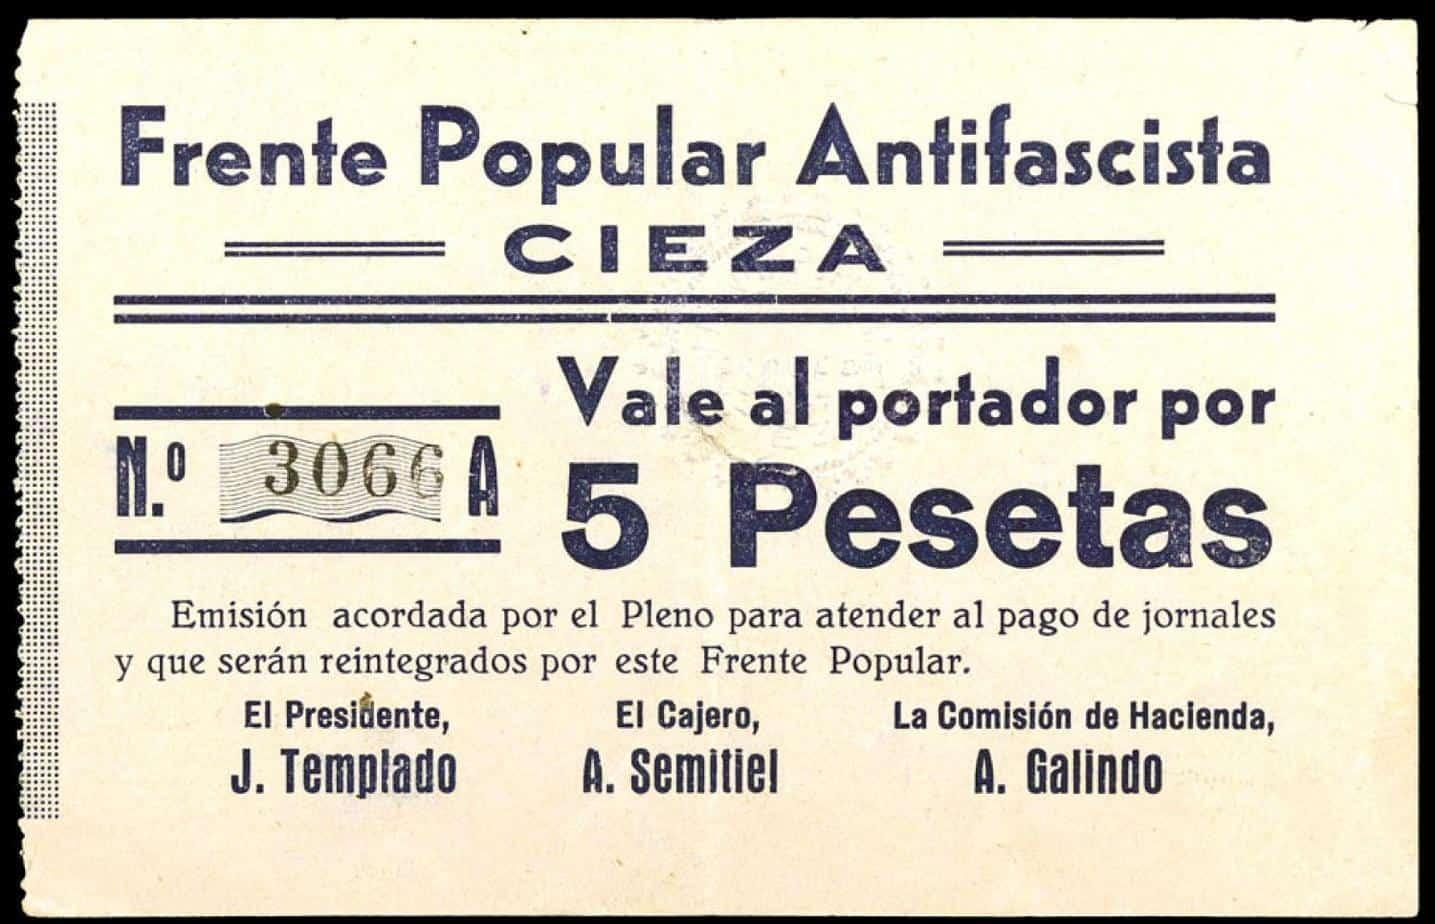 Vale de 5 pesetas. Frente Popular Antifascista. Cieza